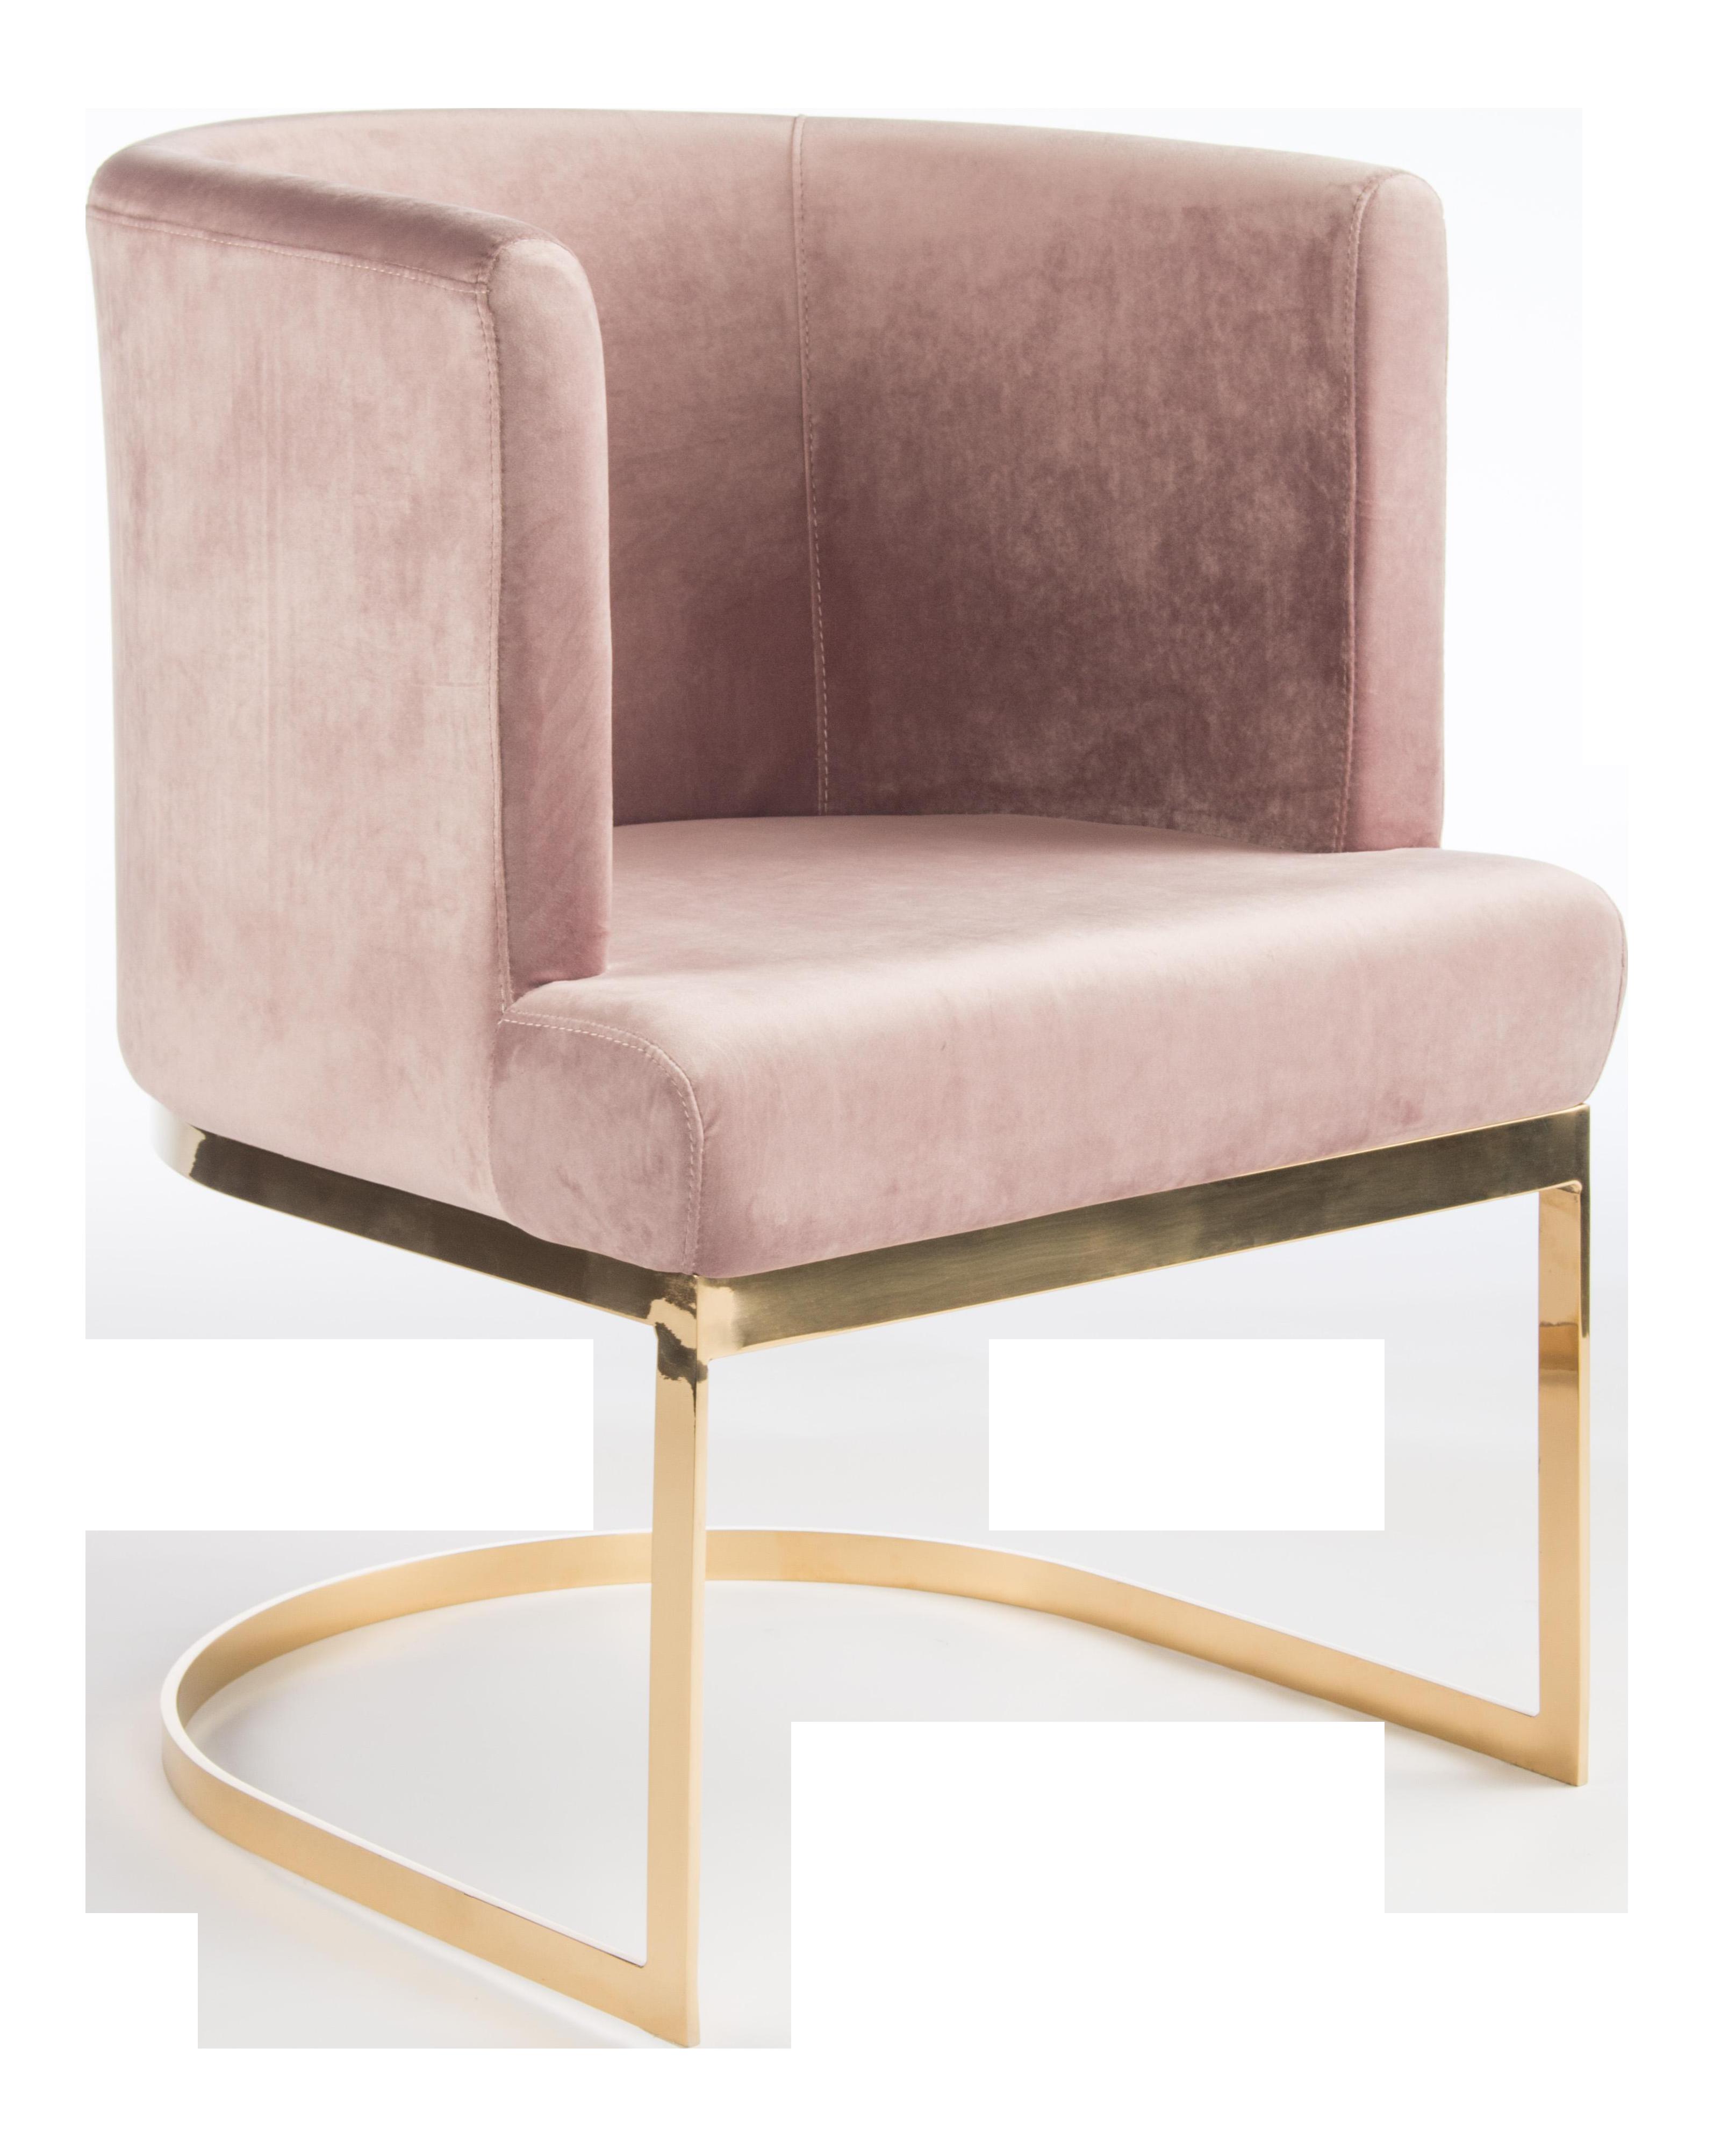 Modern Blush Velvet & Gold Circular Accent Chair Set of 6